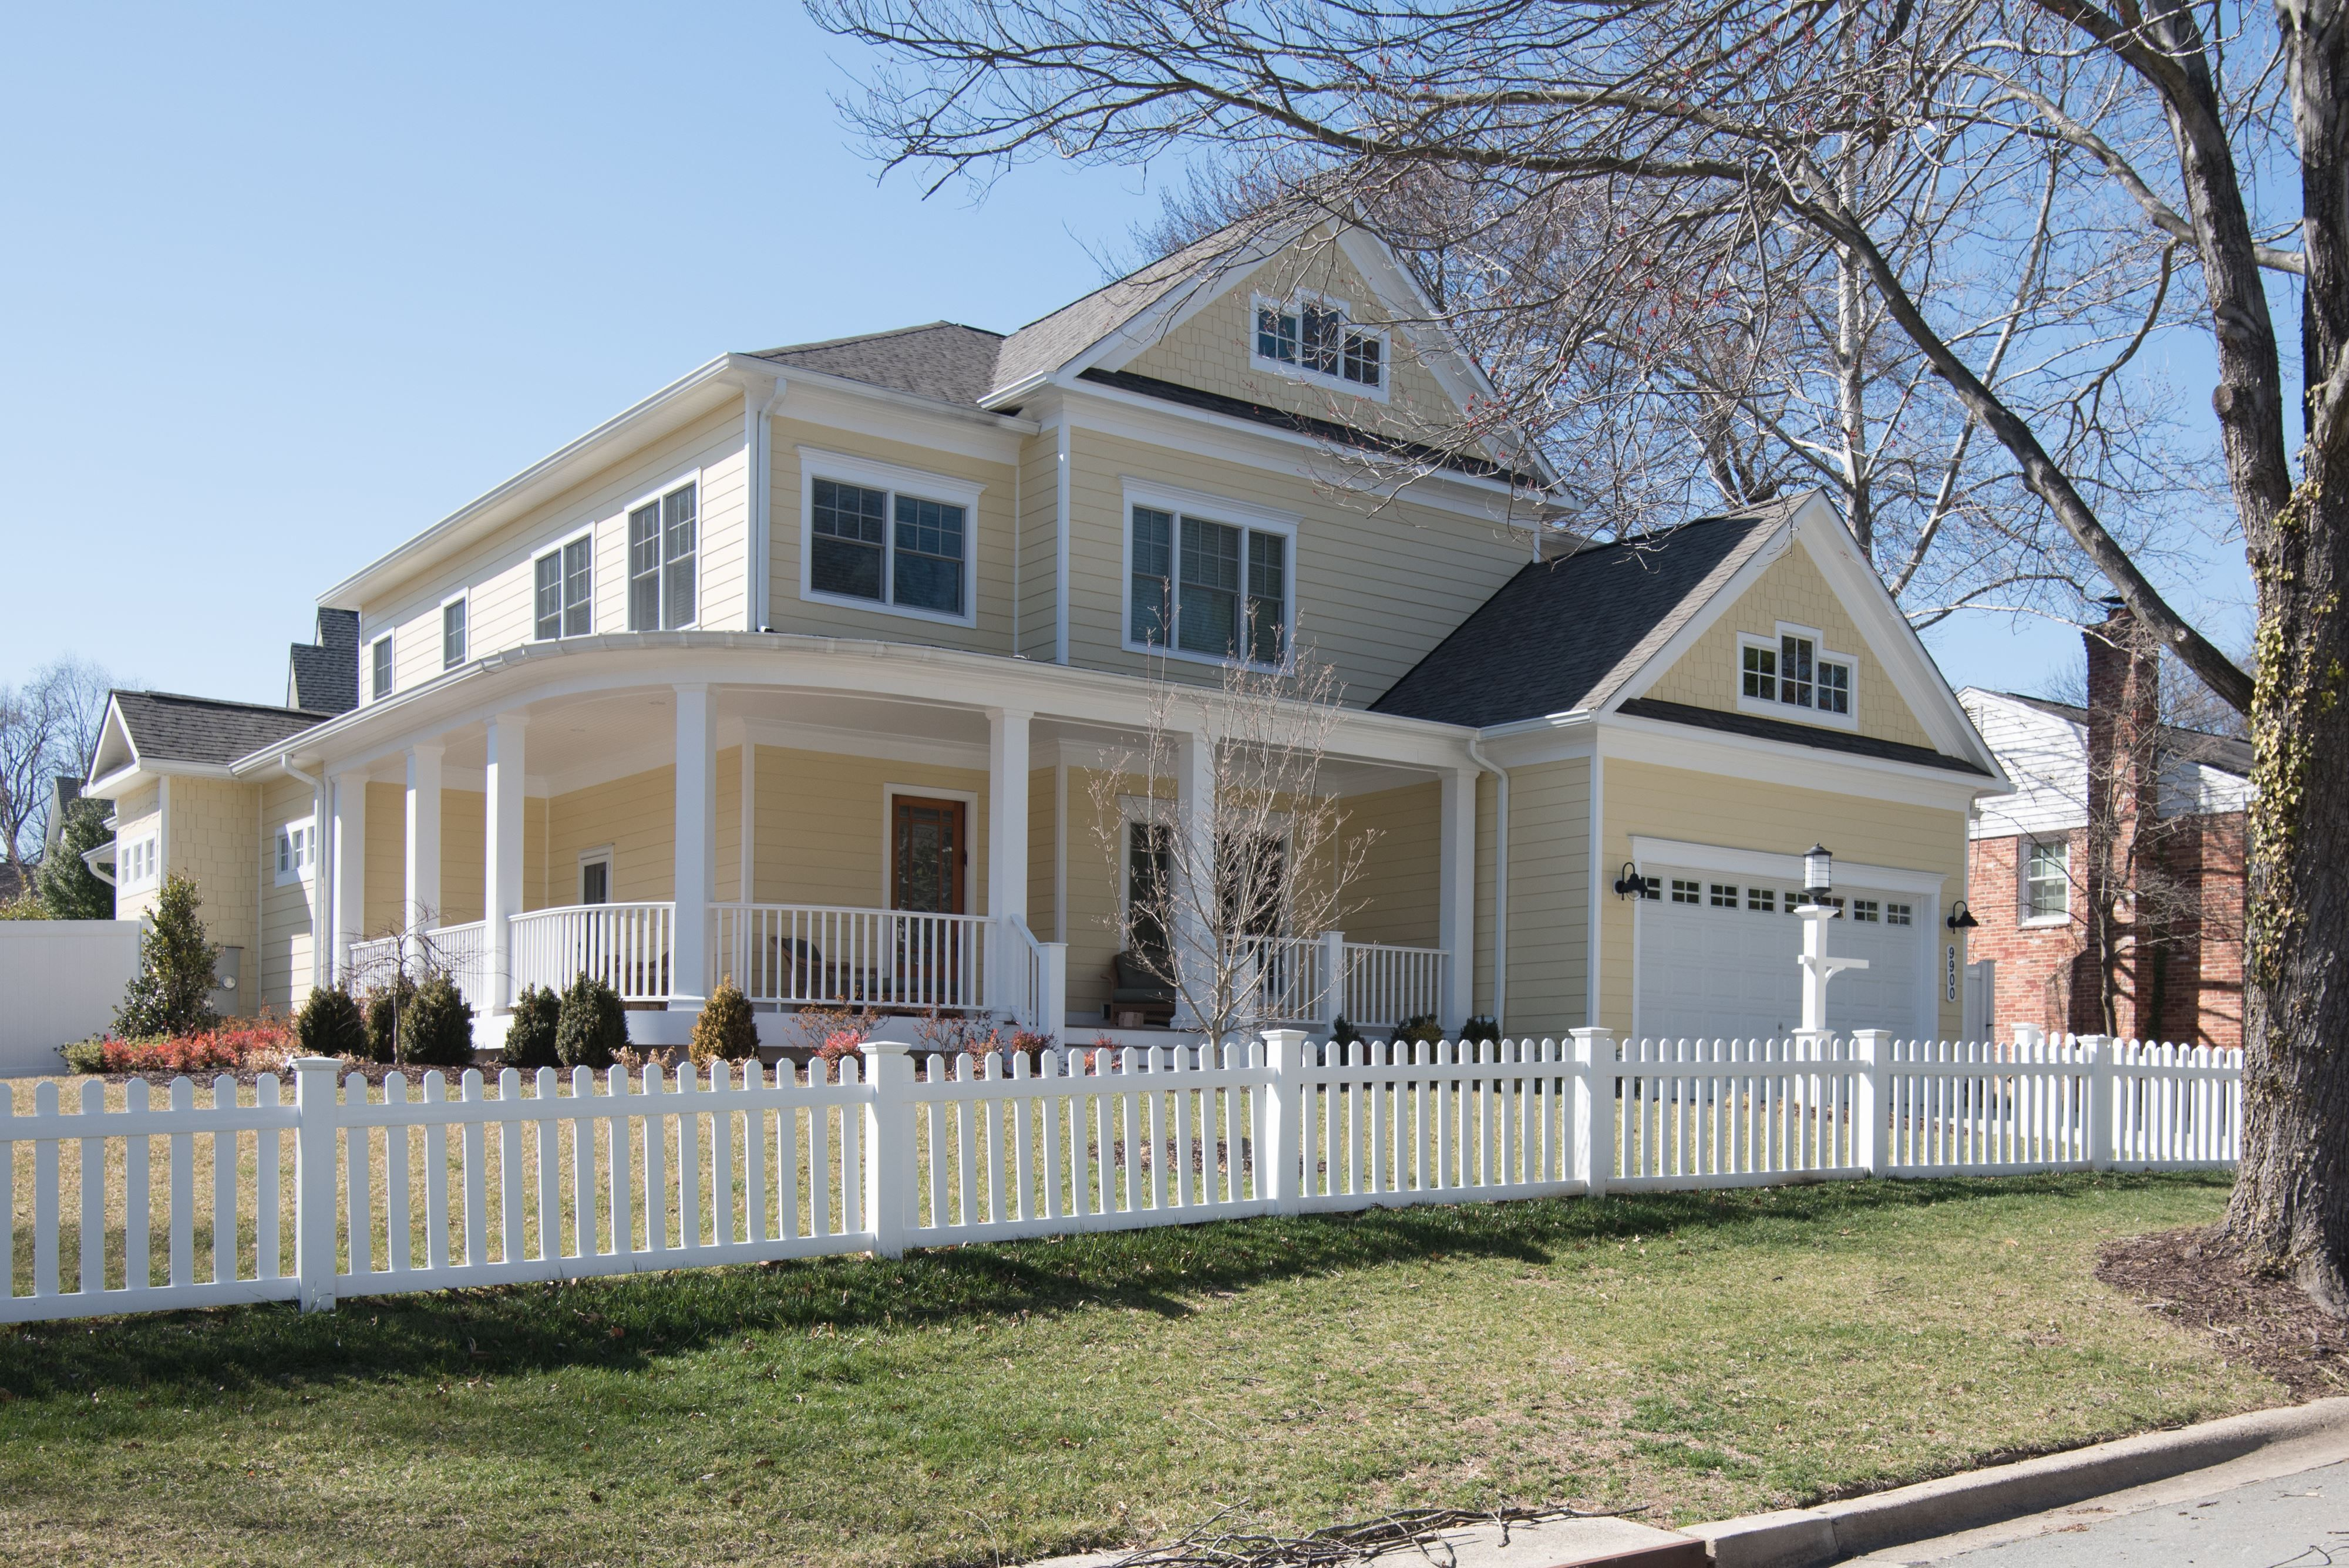 GOLD AWARD Custom Home between 35005000 sq ft MidAtlantic